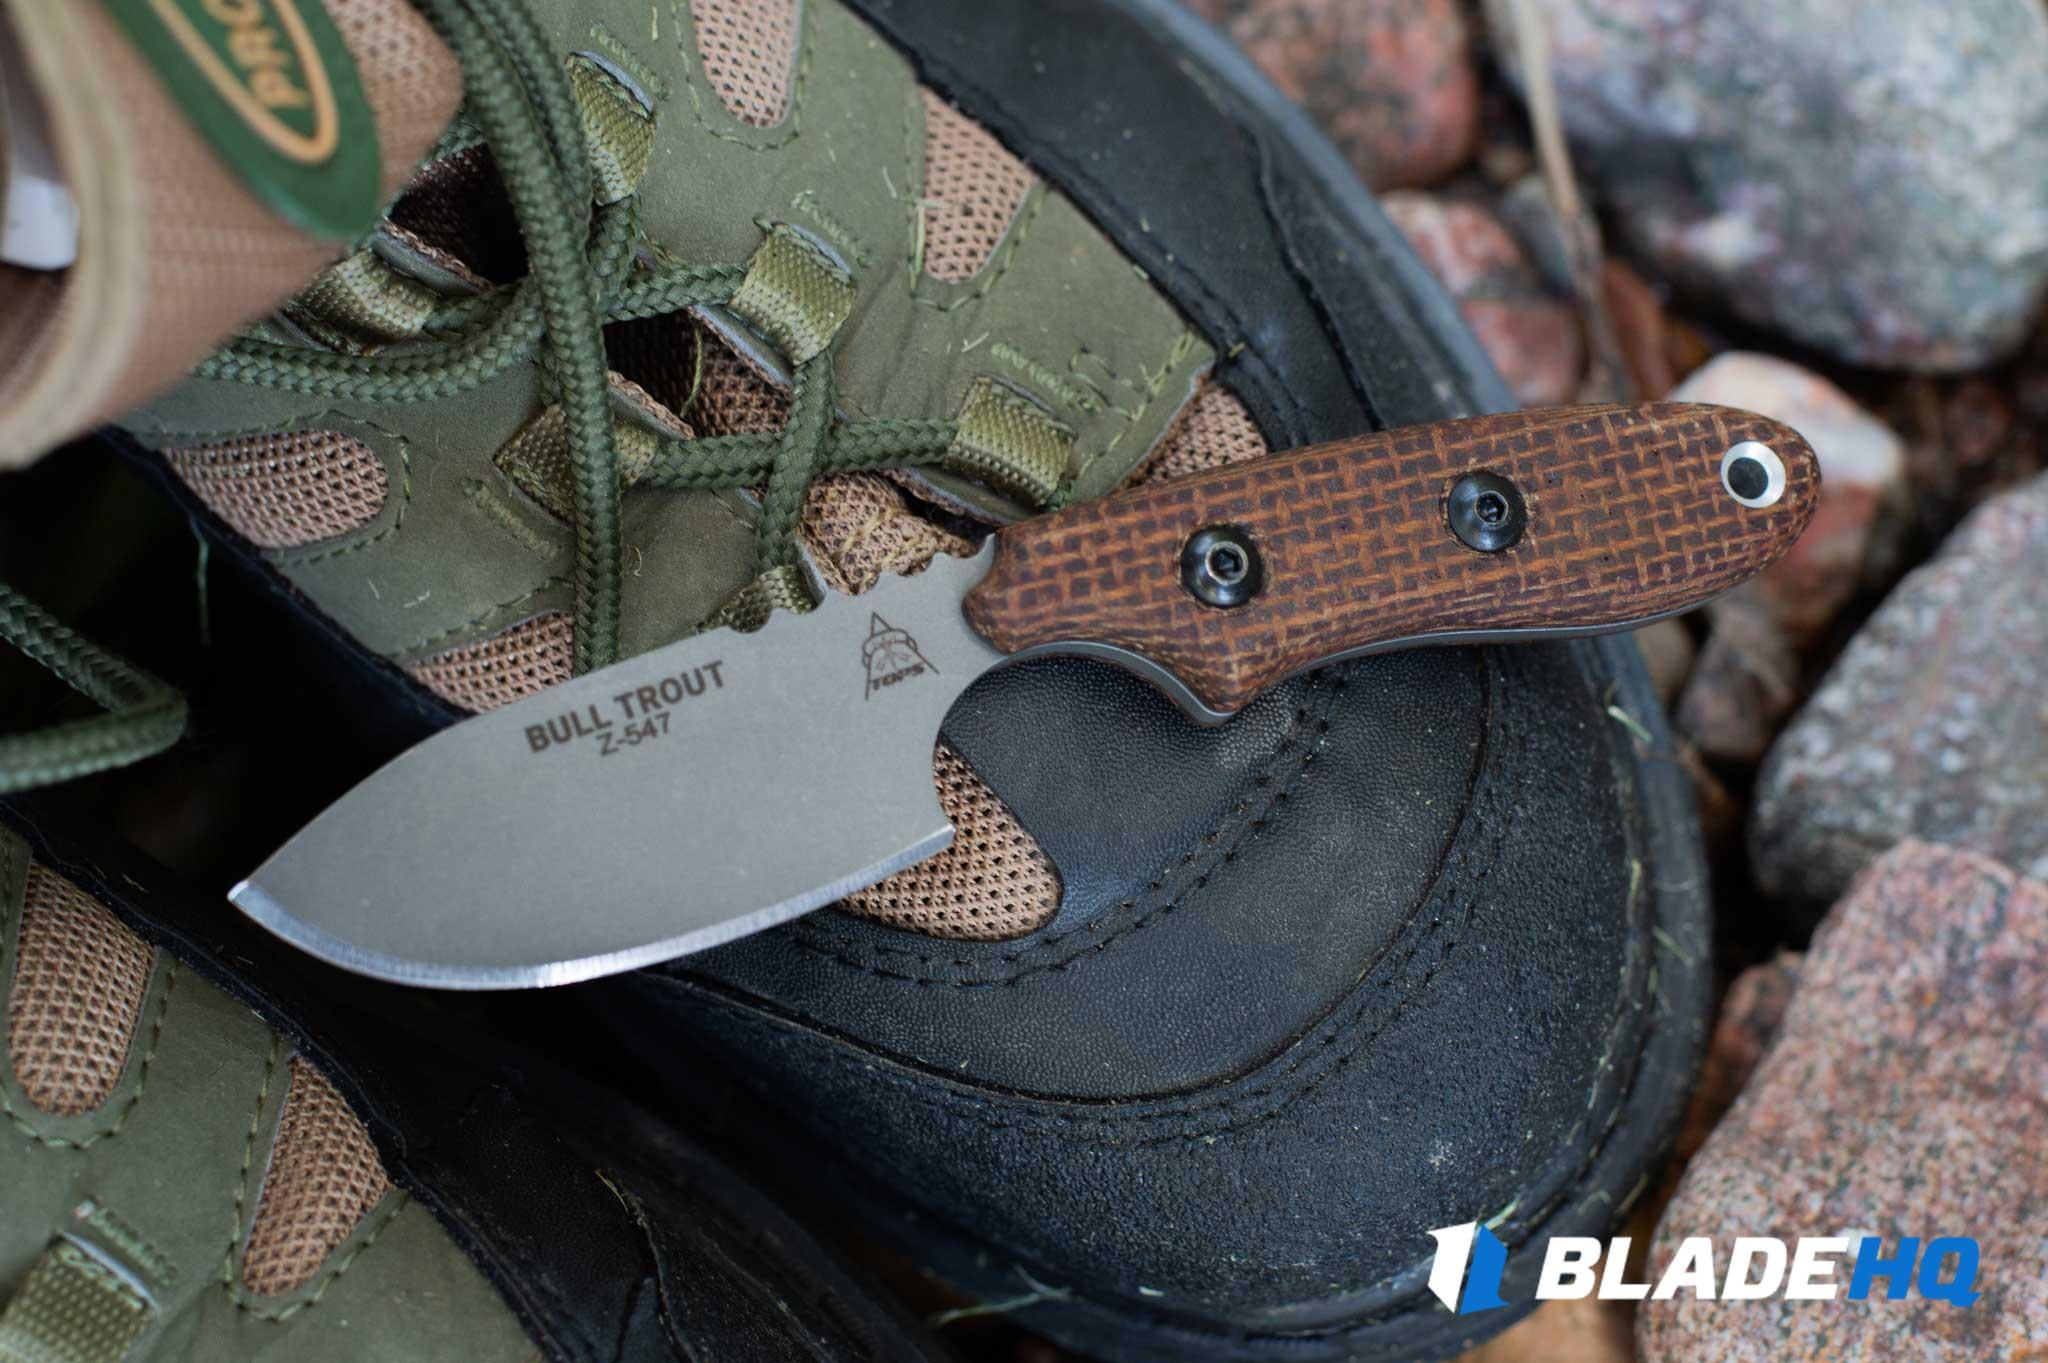 TOPS Knives Bull Trout Materials